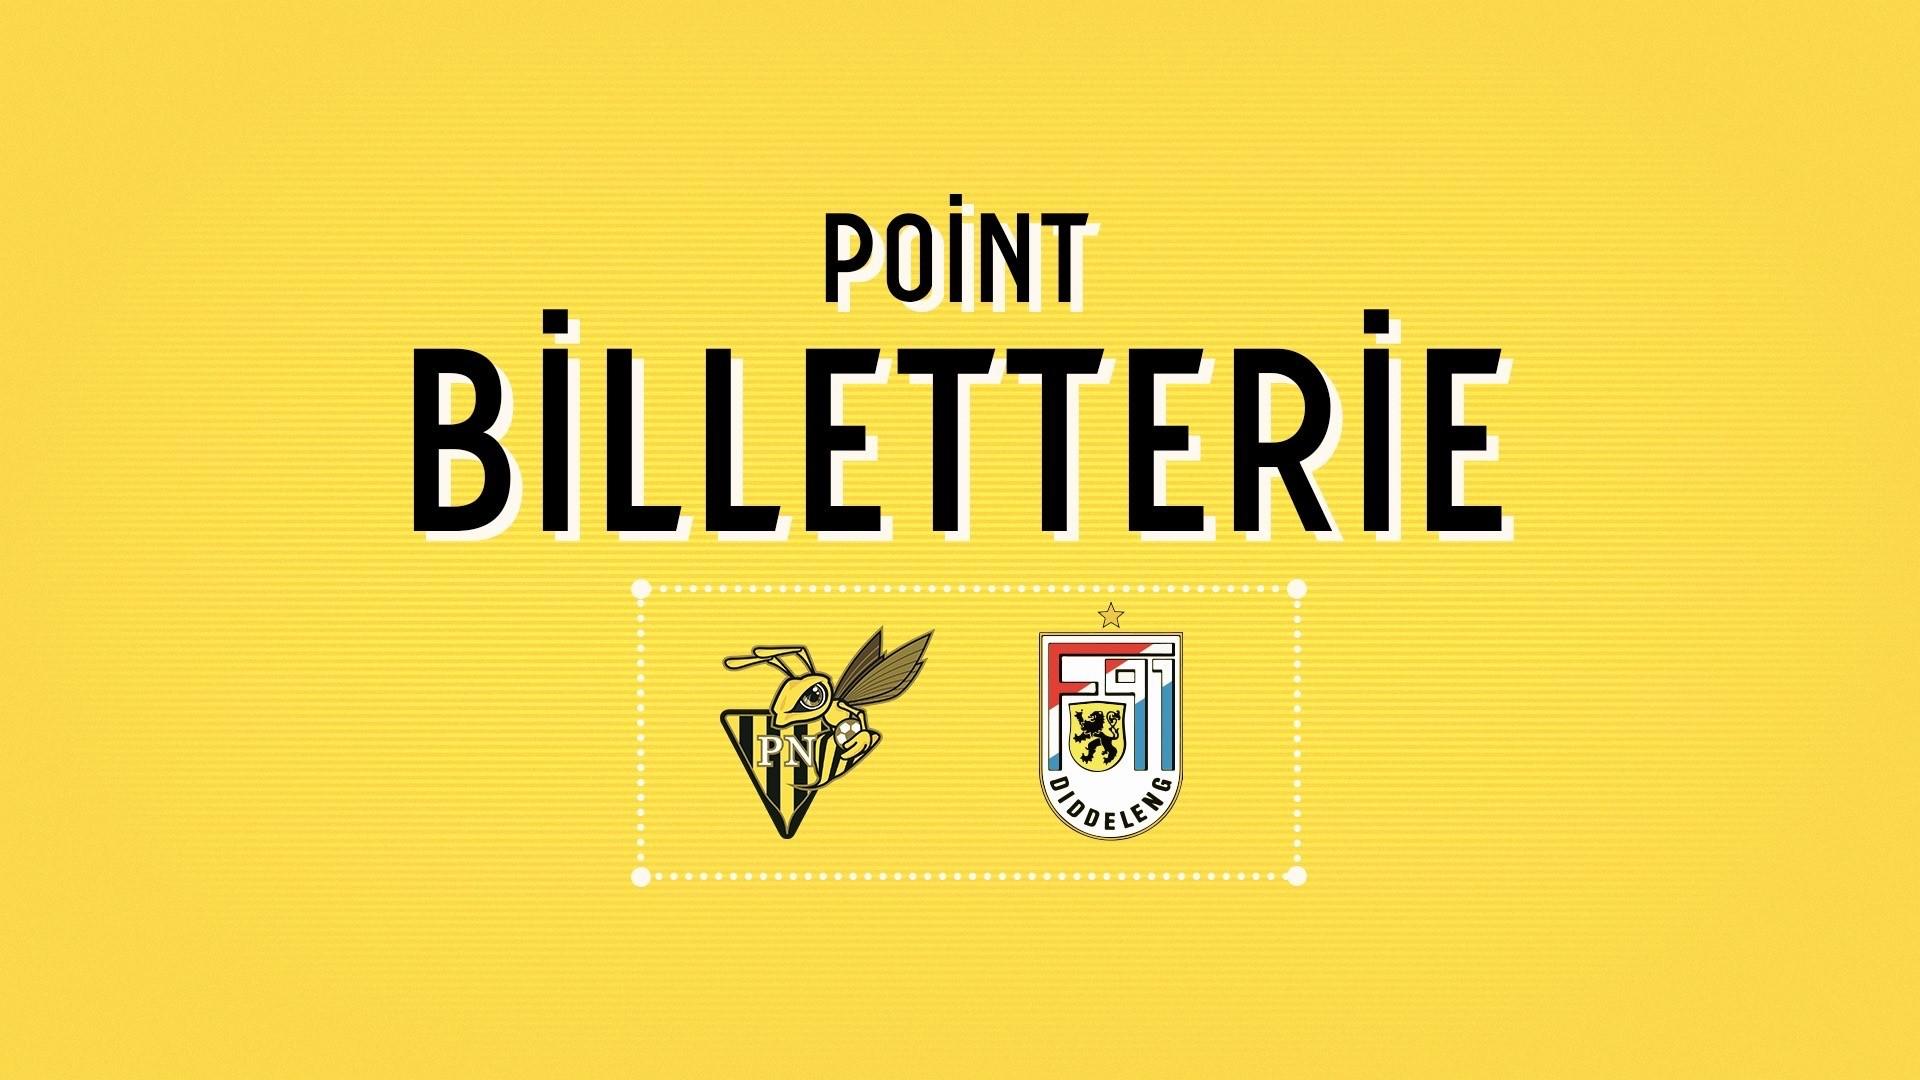 POINT BILLETTERIE : Progrès Niederkorn - F91 Diddeleng